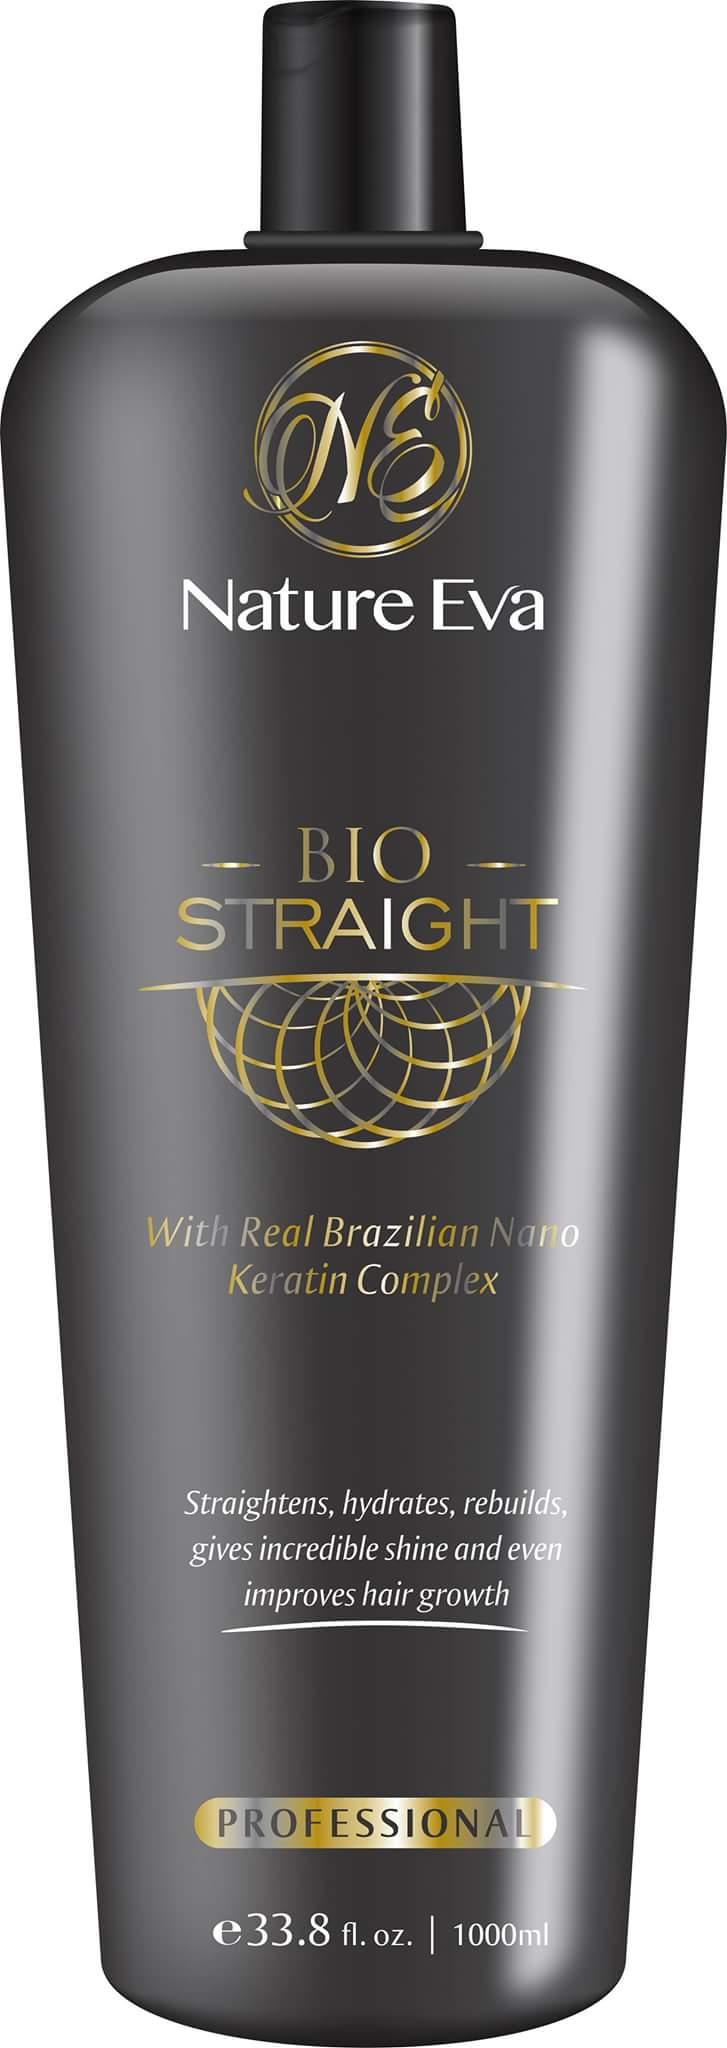 lissage brésilien Nanoplastie Bio Straight-hairstylist-le-lab-montpellier